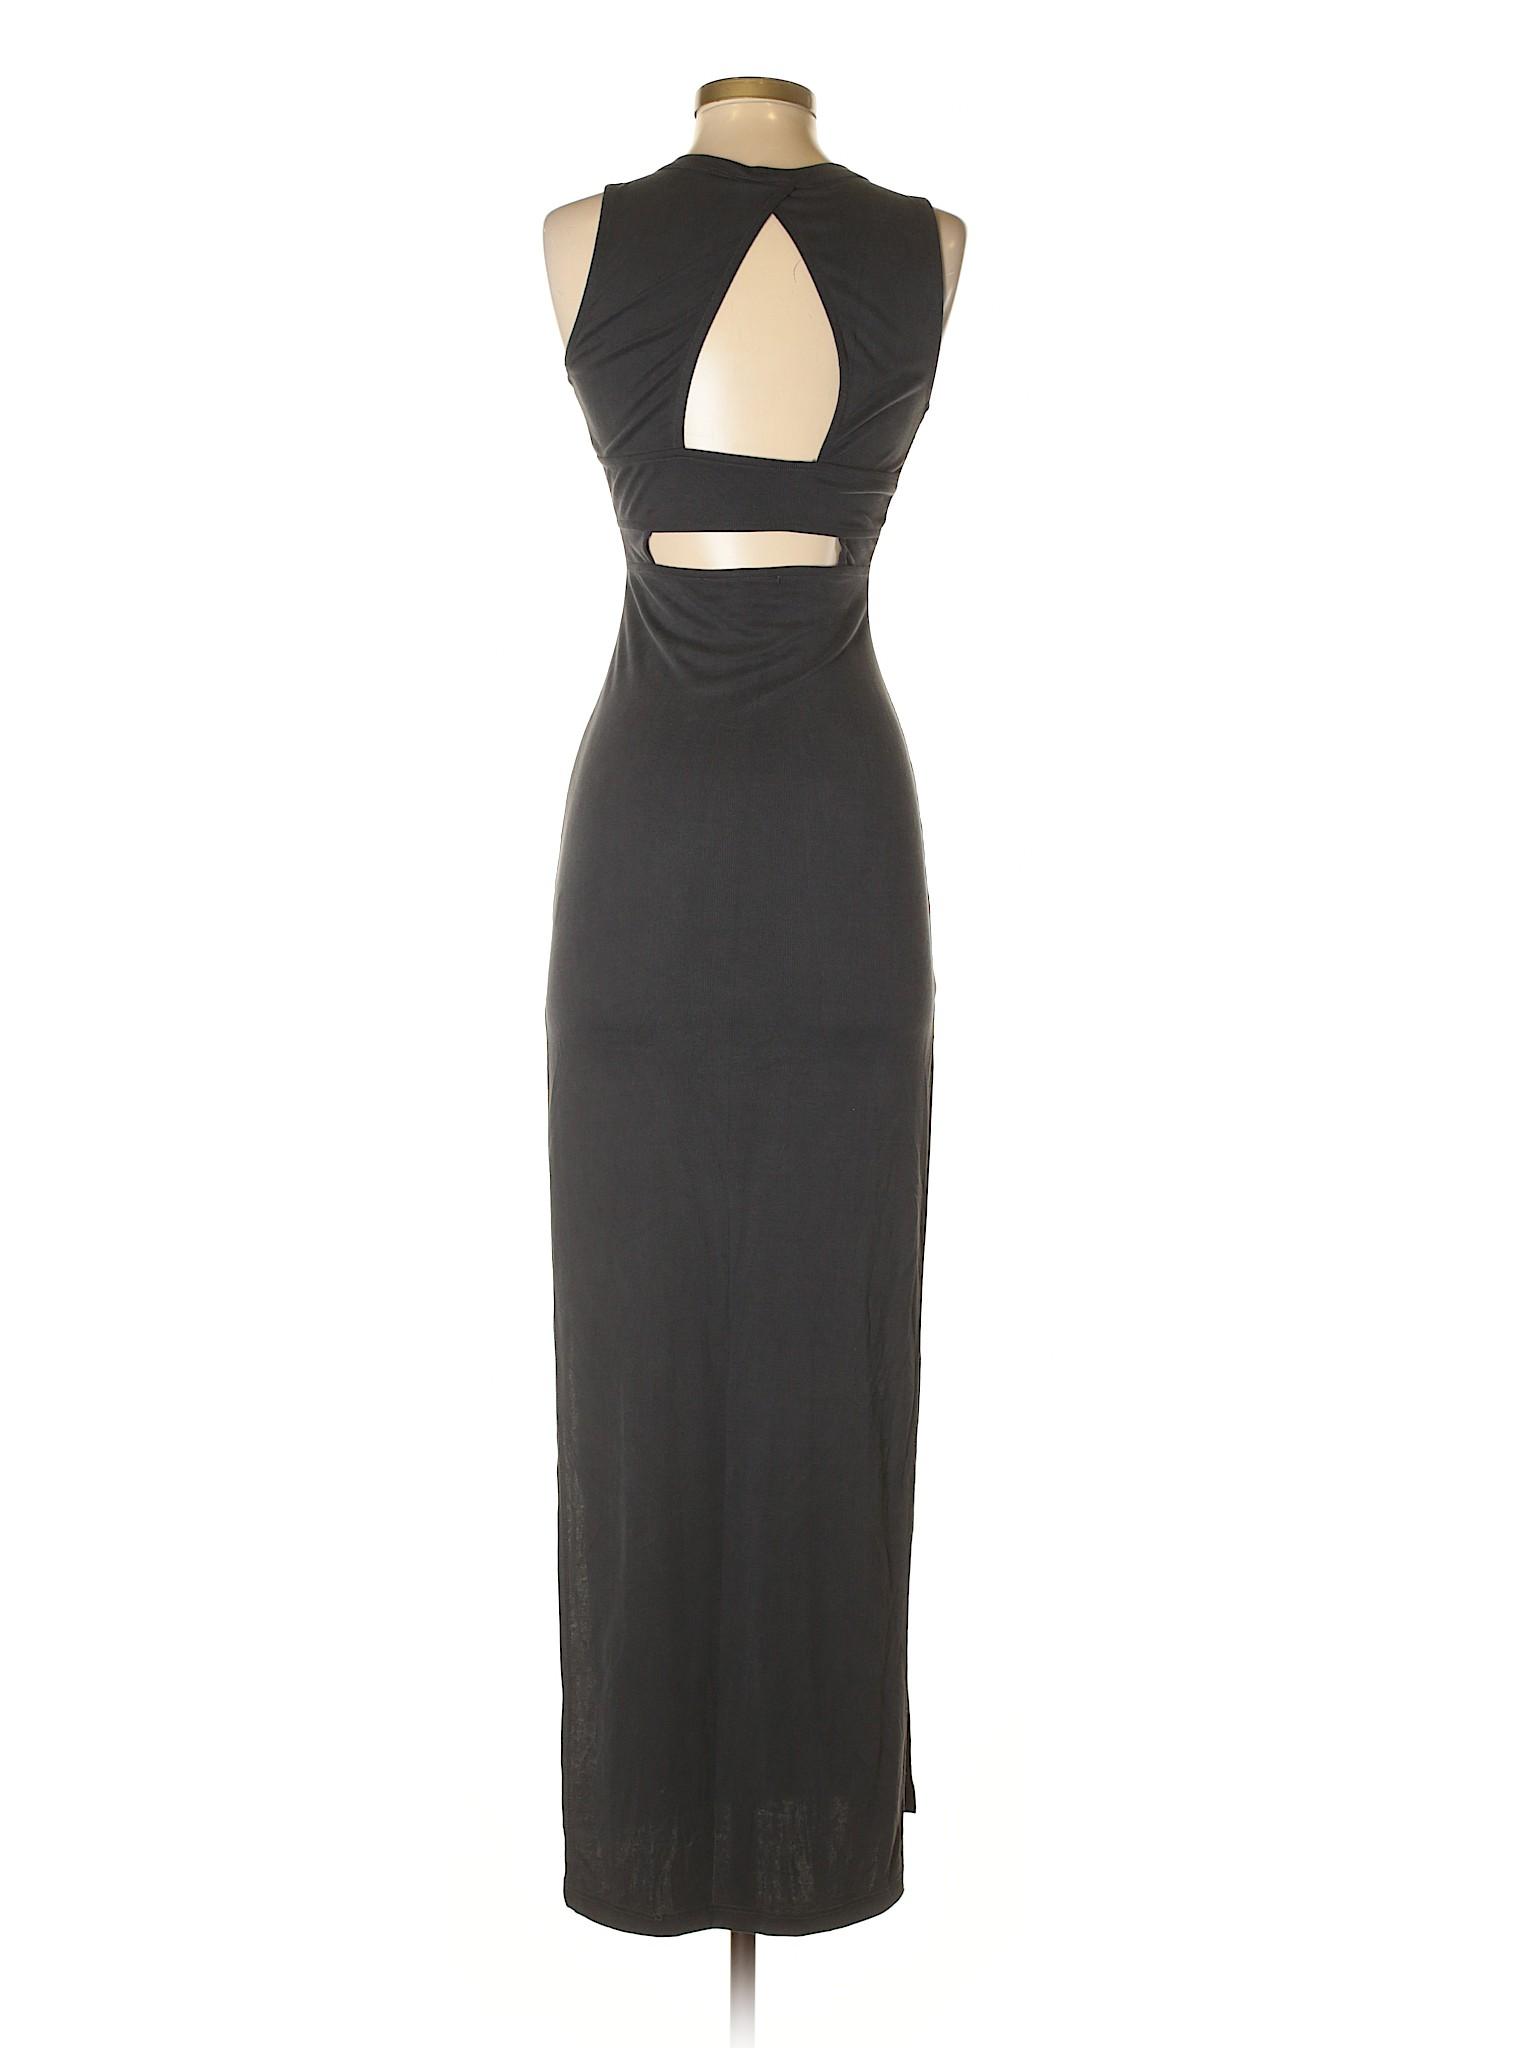 Selling Lulu's Selling Dress Lulu's Dress Casual Selling Lulu's Casual 4wPwYqX